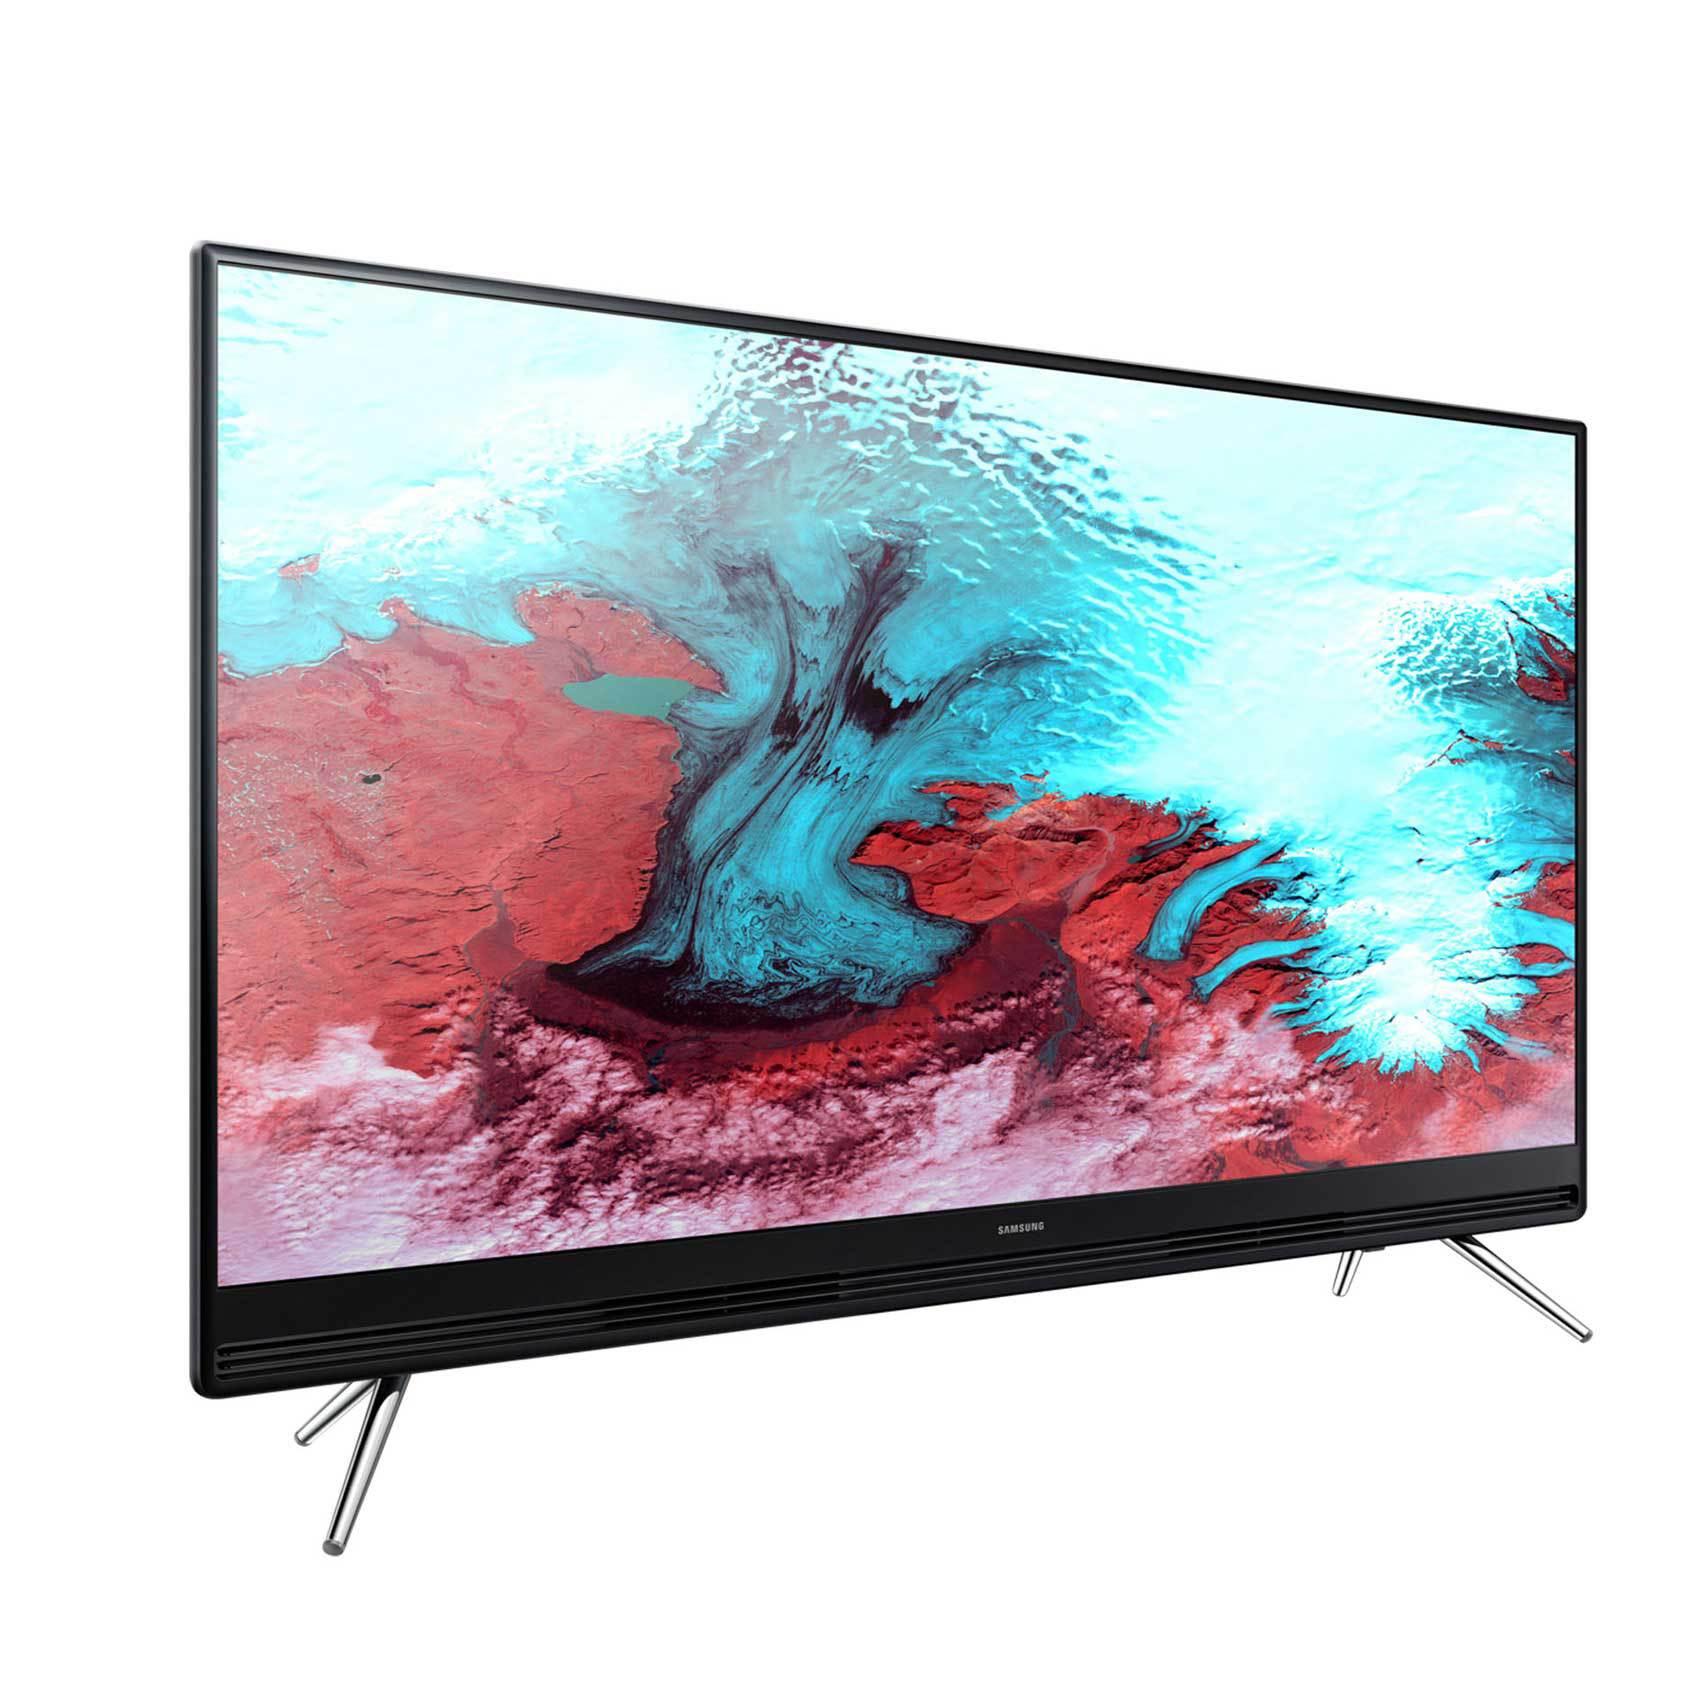 SAMSUNG LED TV 40